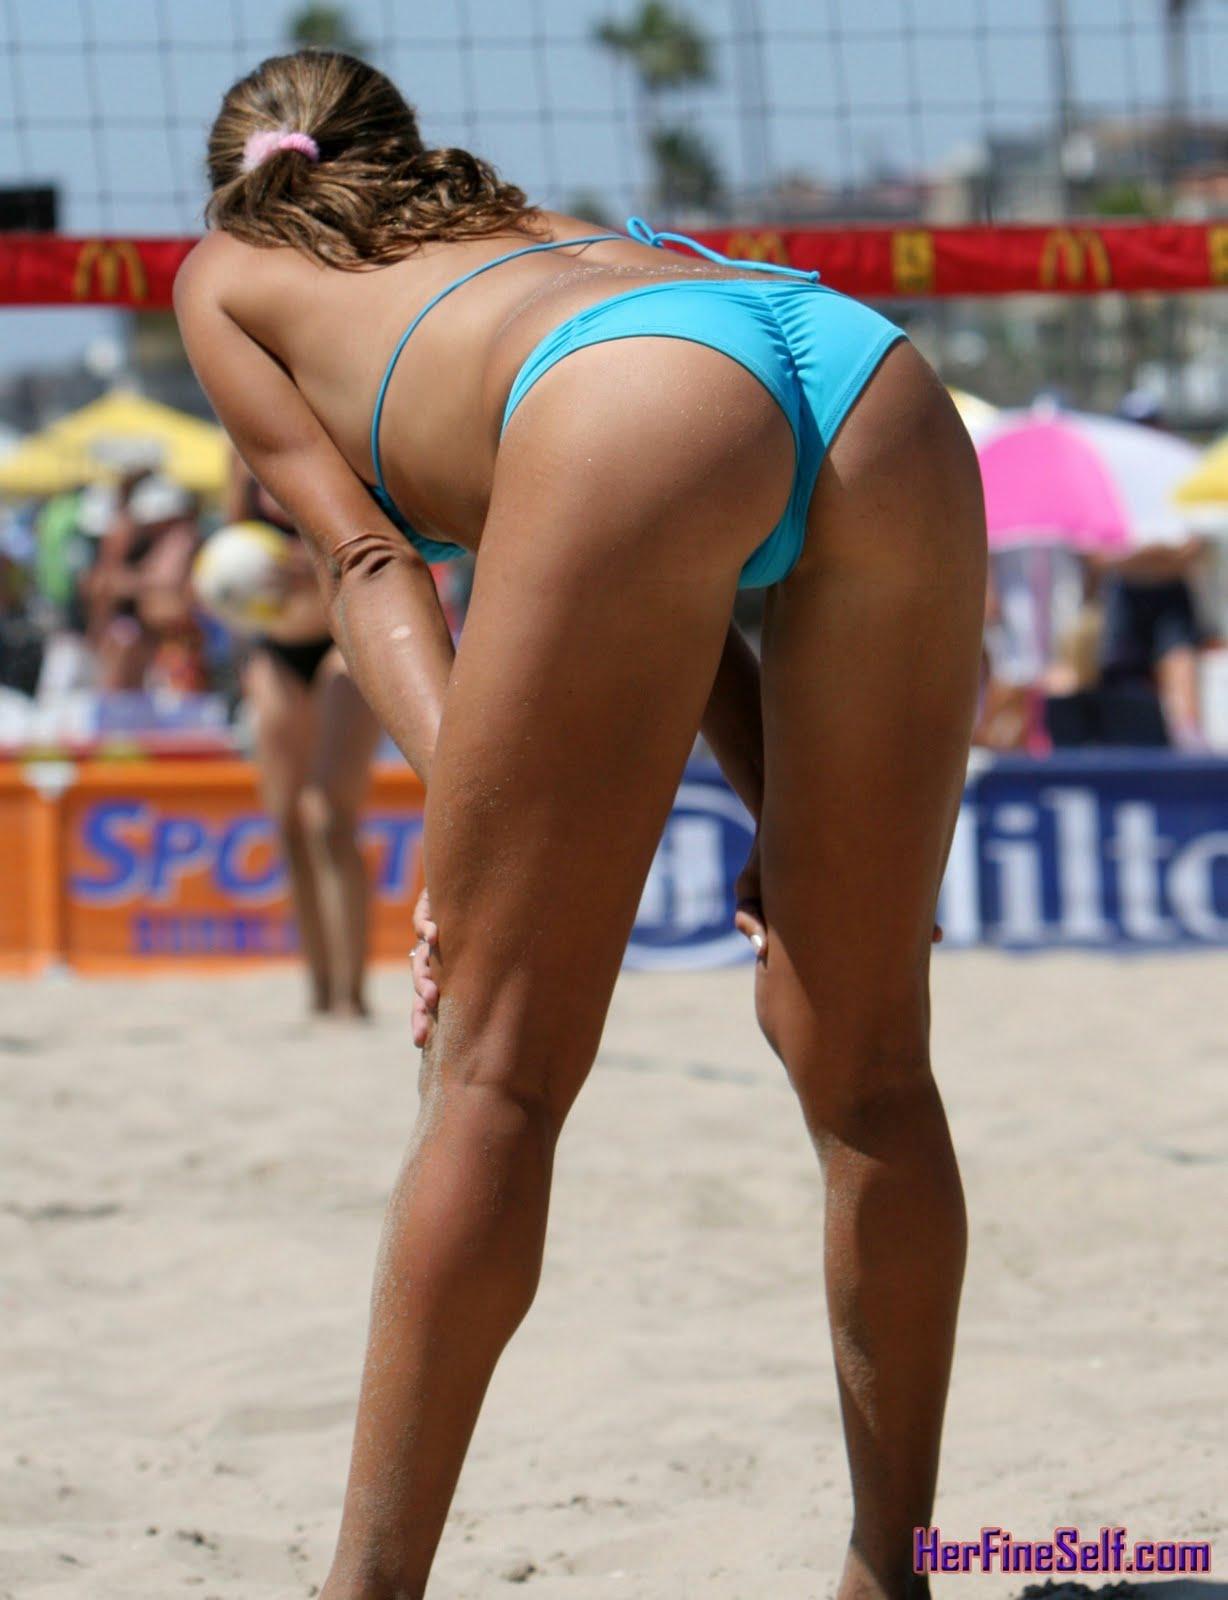 Volleyball beach girl pussy slip